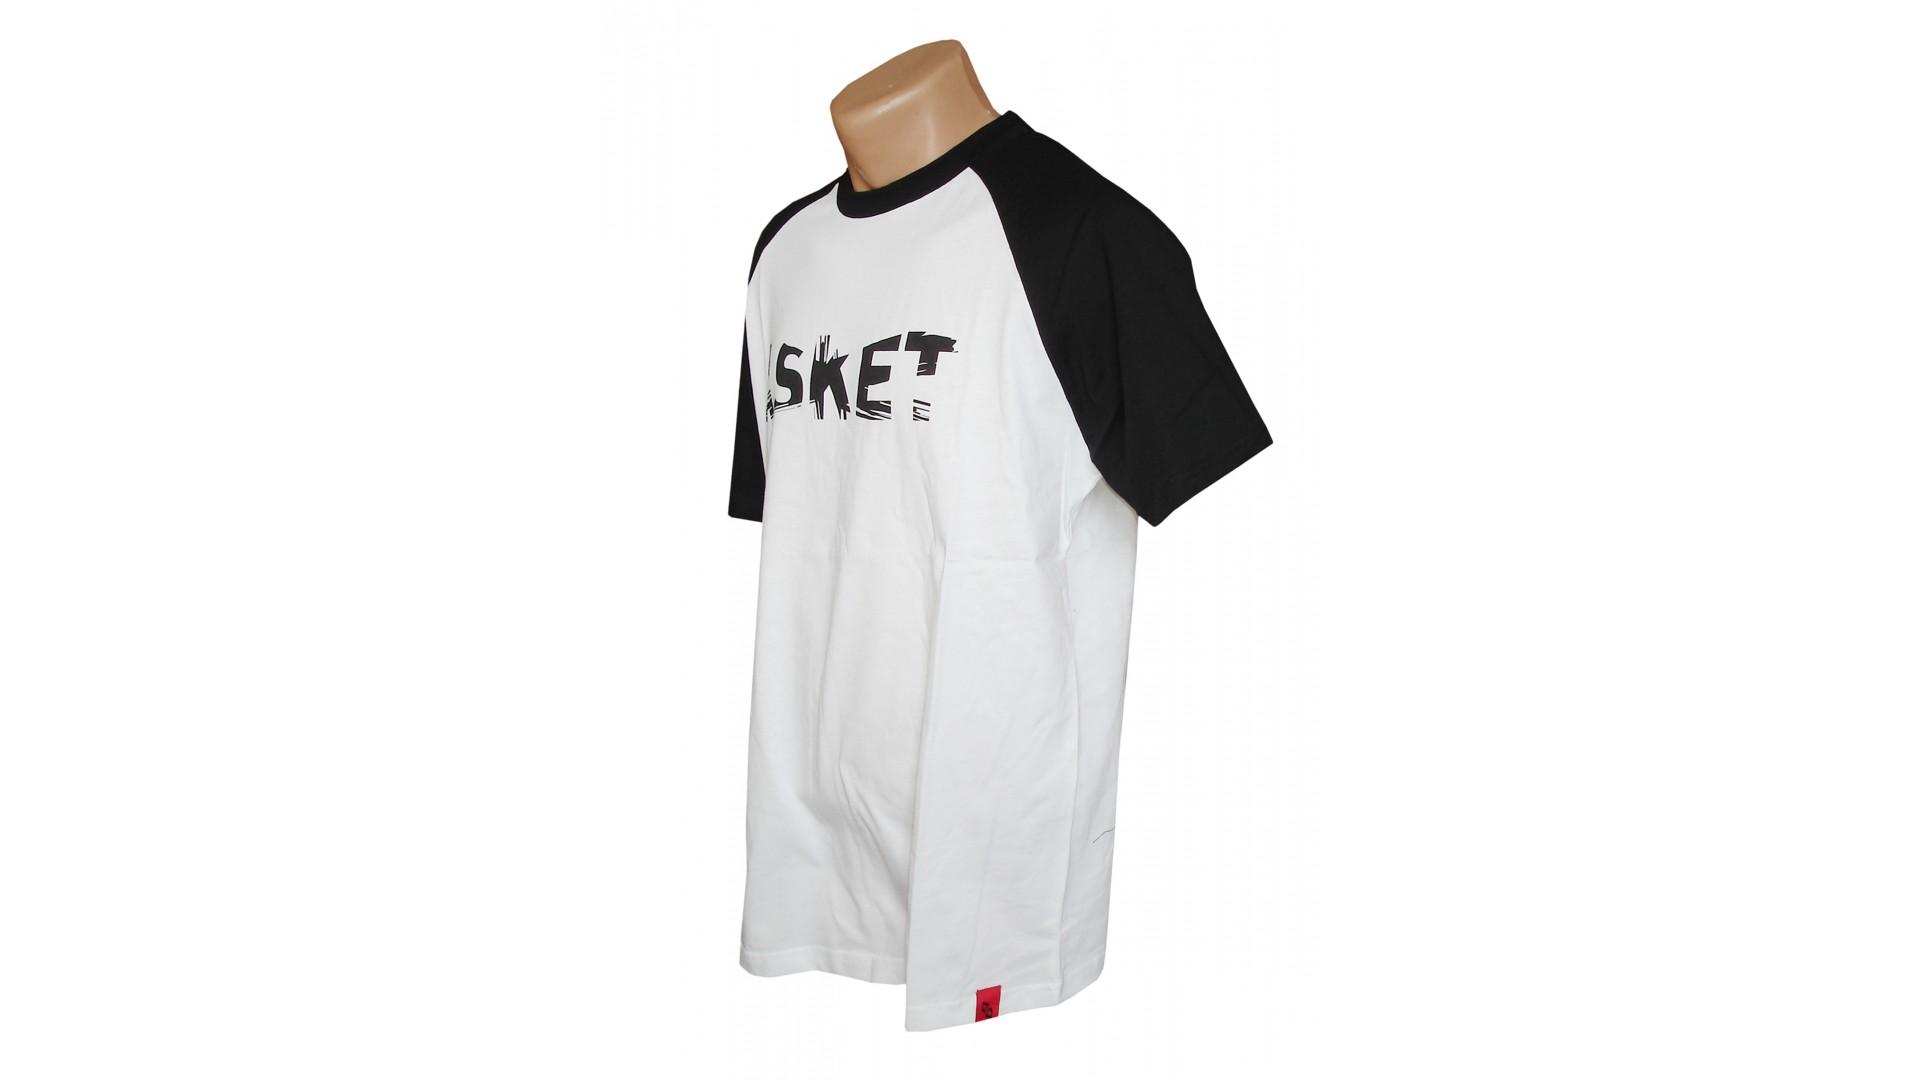 Футболка Ghost T-shirt ASKET white/black год 2016